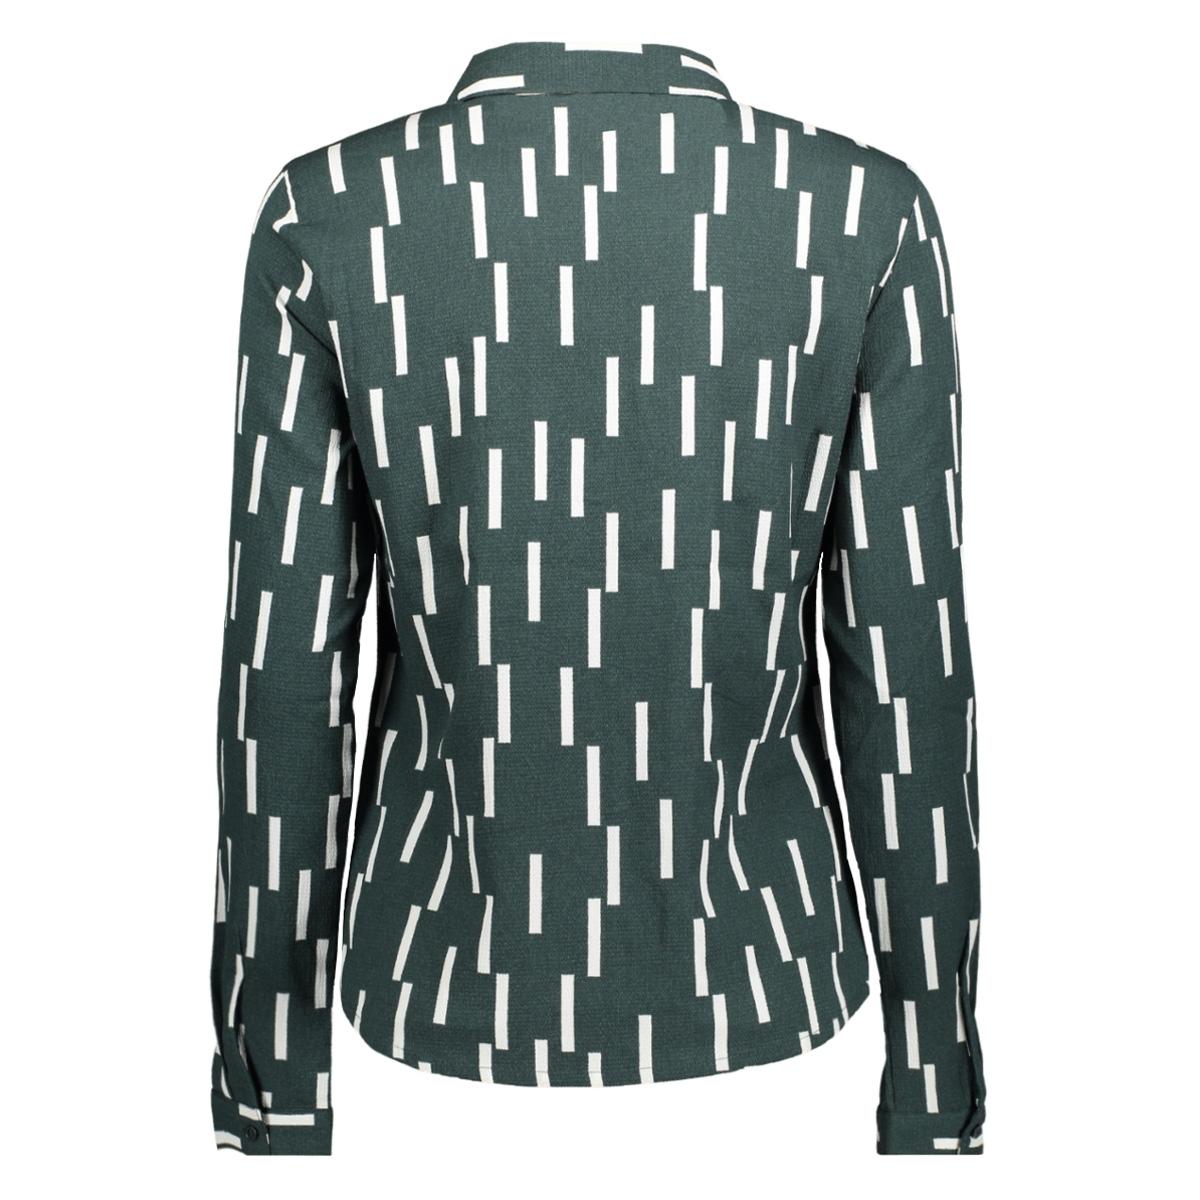 vmstinne l/s shirt d2 lcs 10199273 vero moda blouse green gables/snow white